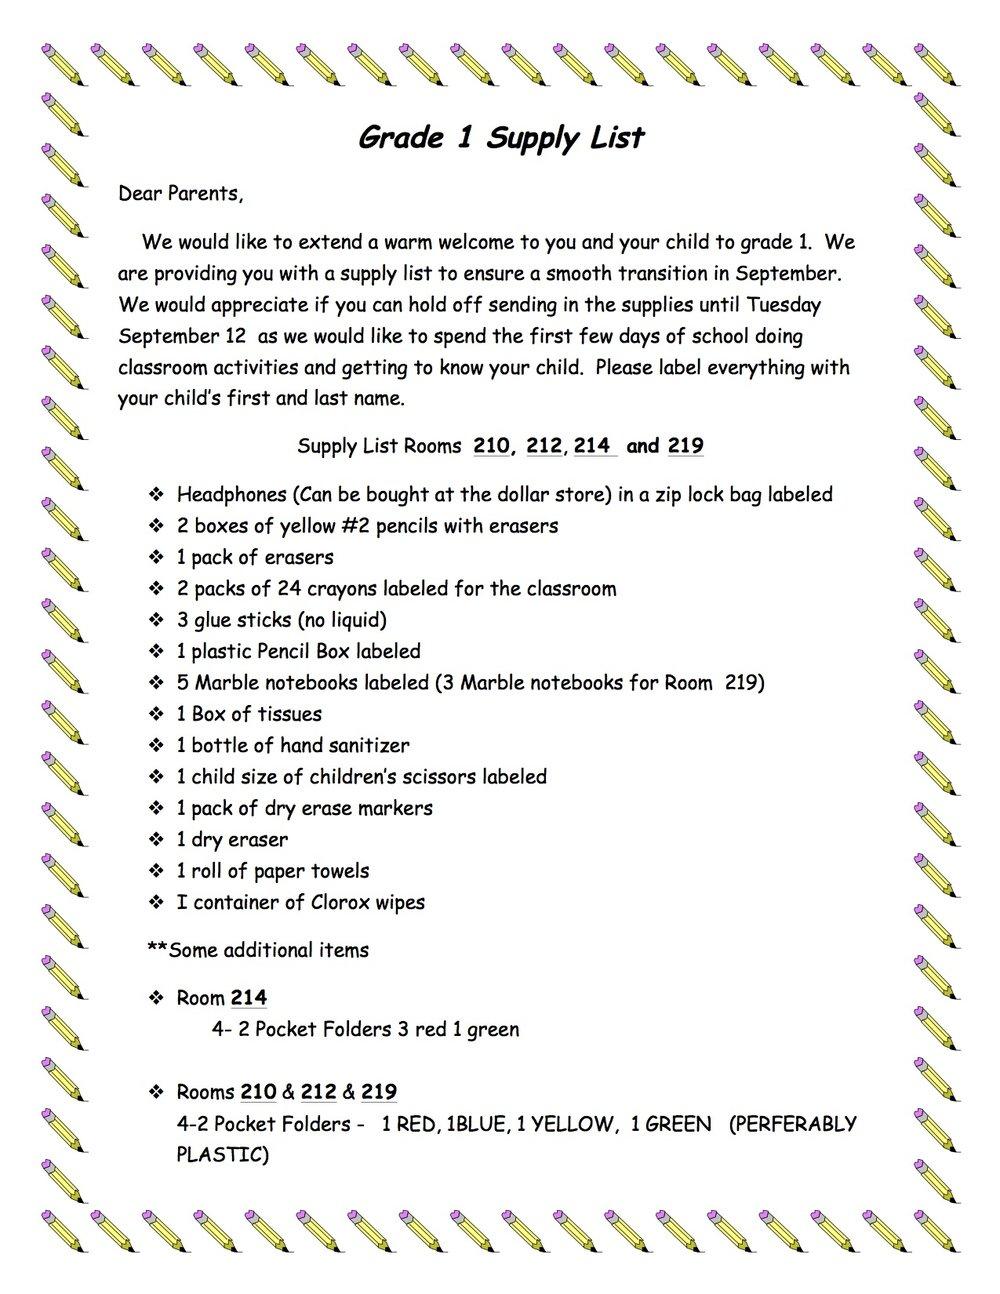 Grade 1 Supply List 210_212_214_219